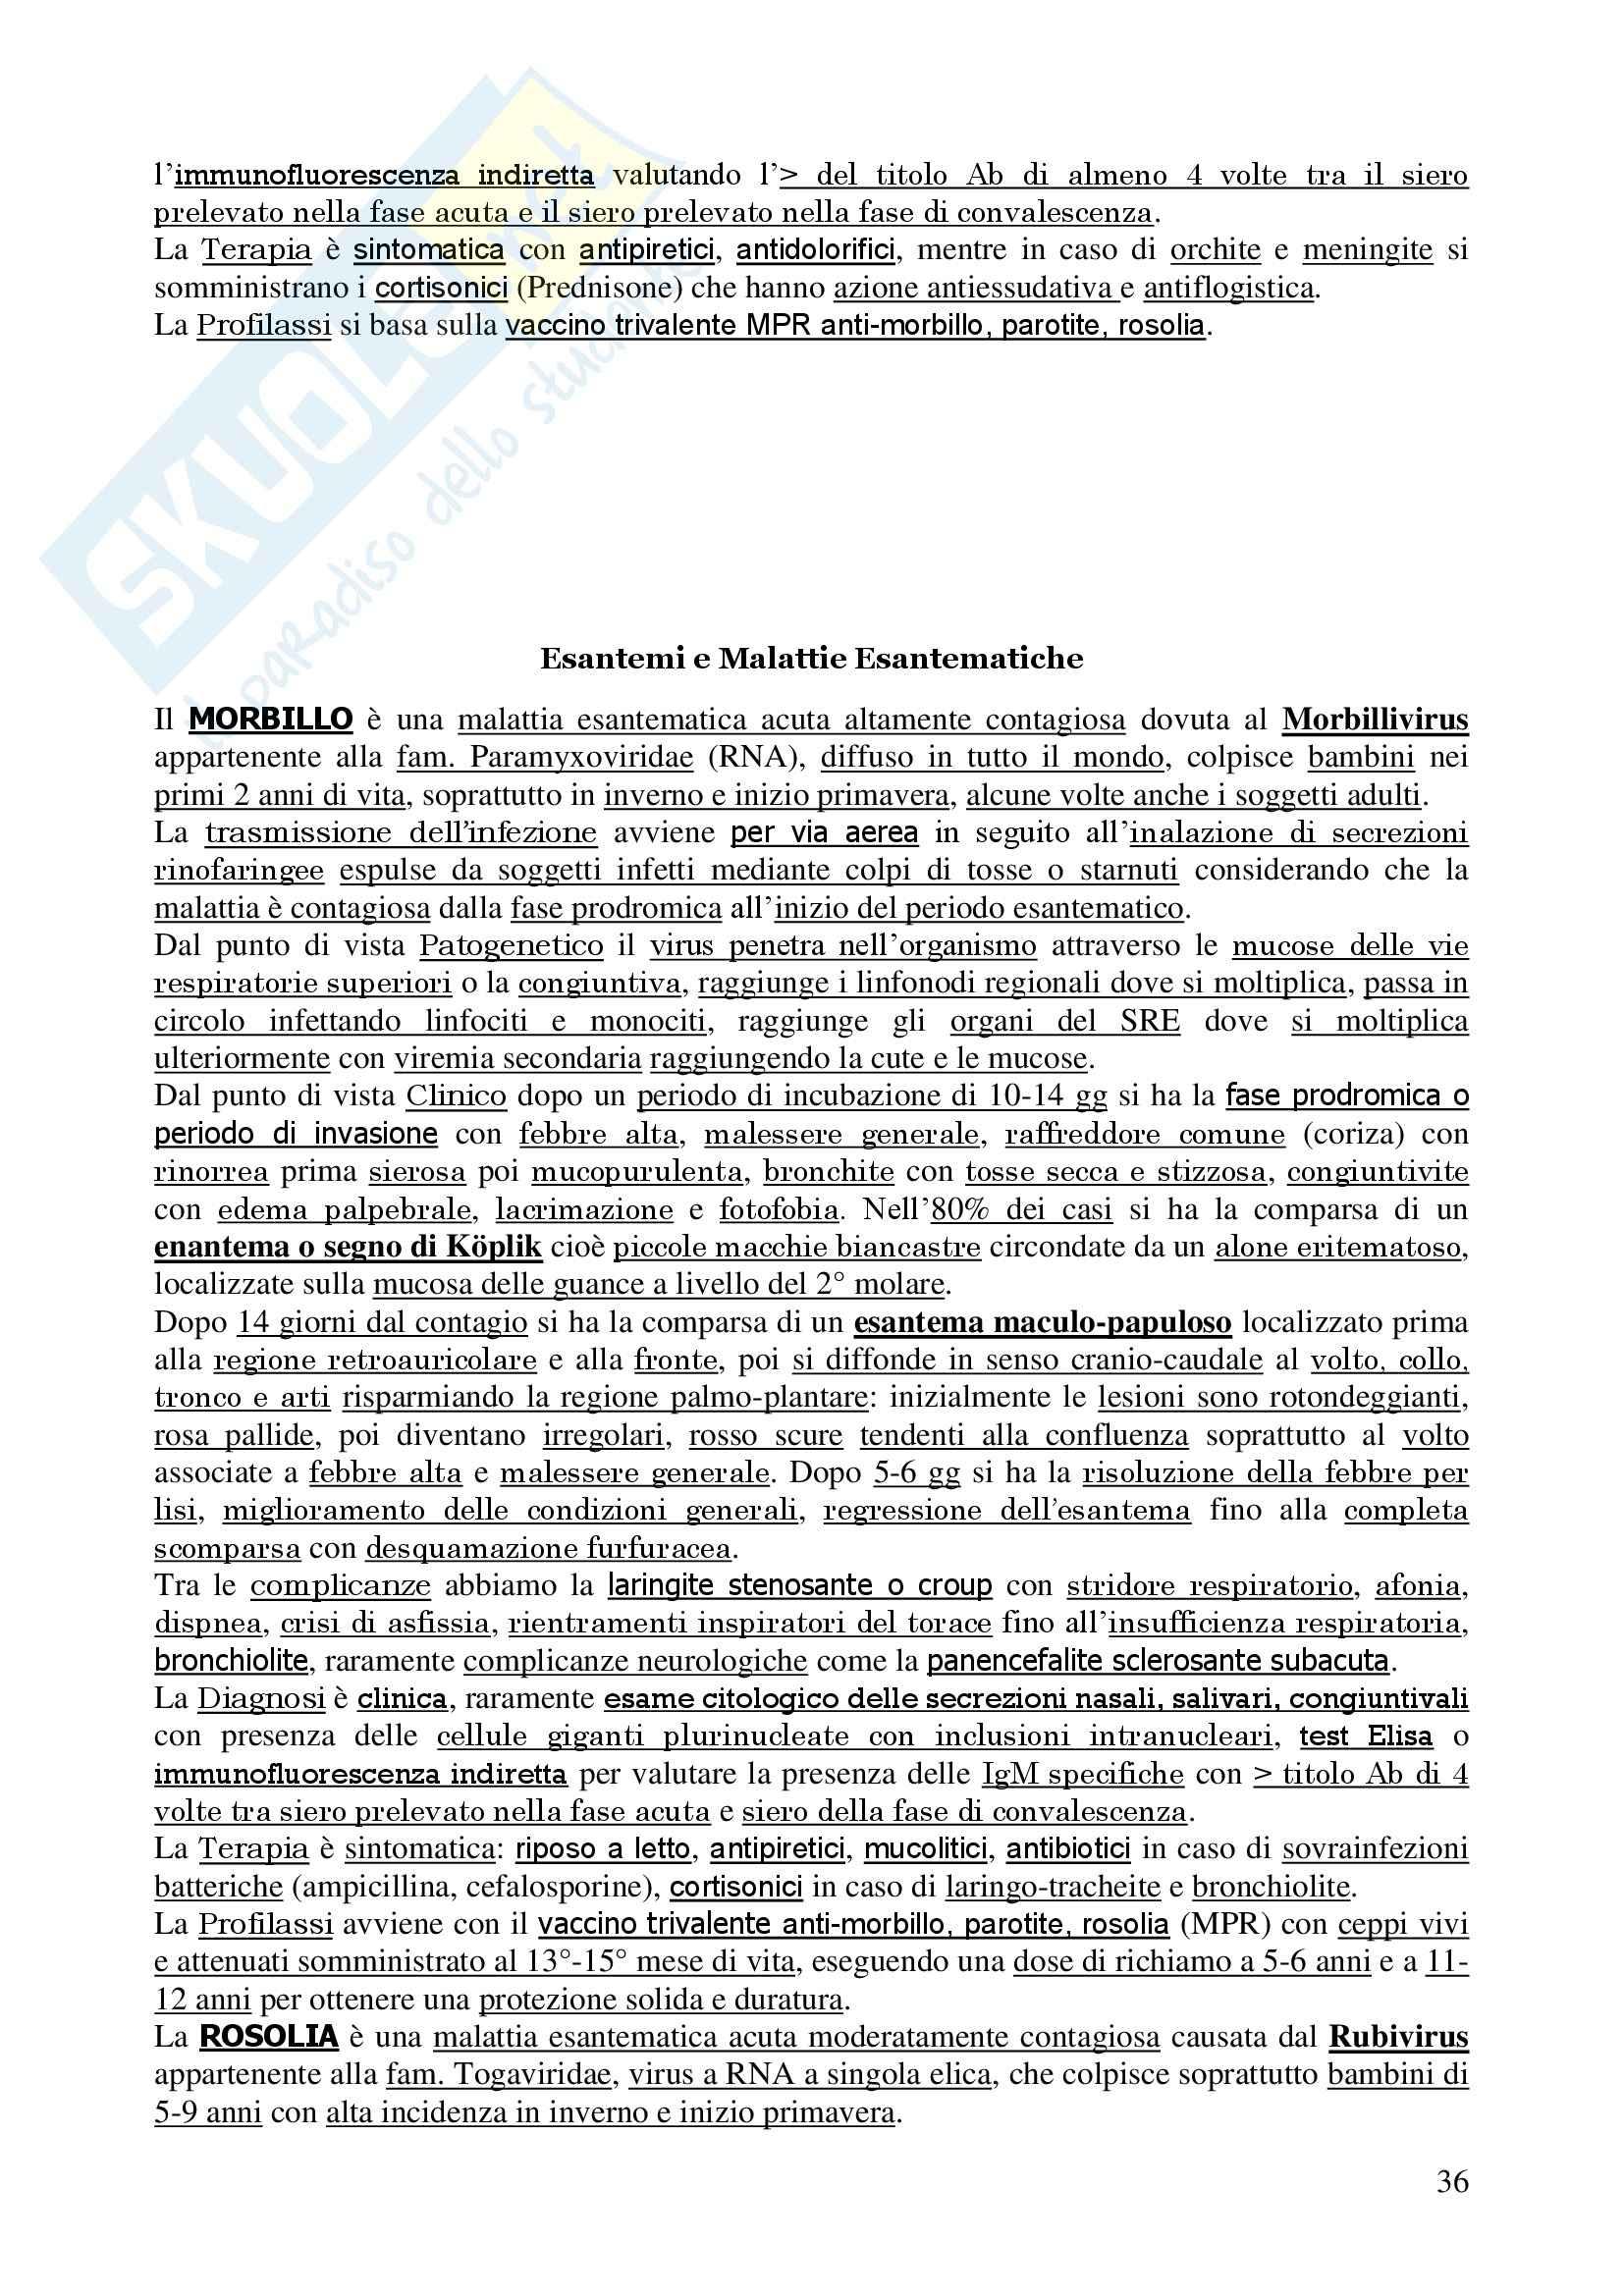 Malattie Infettive Pag. 36